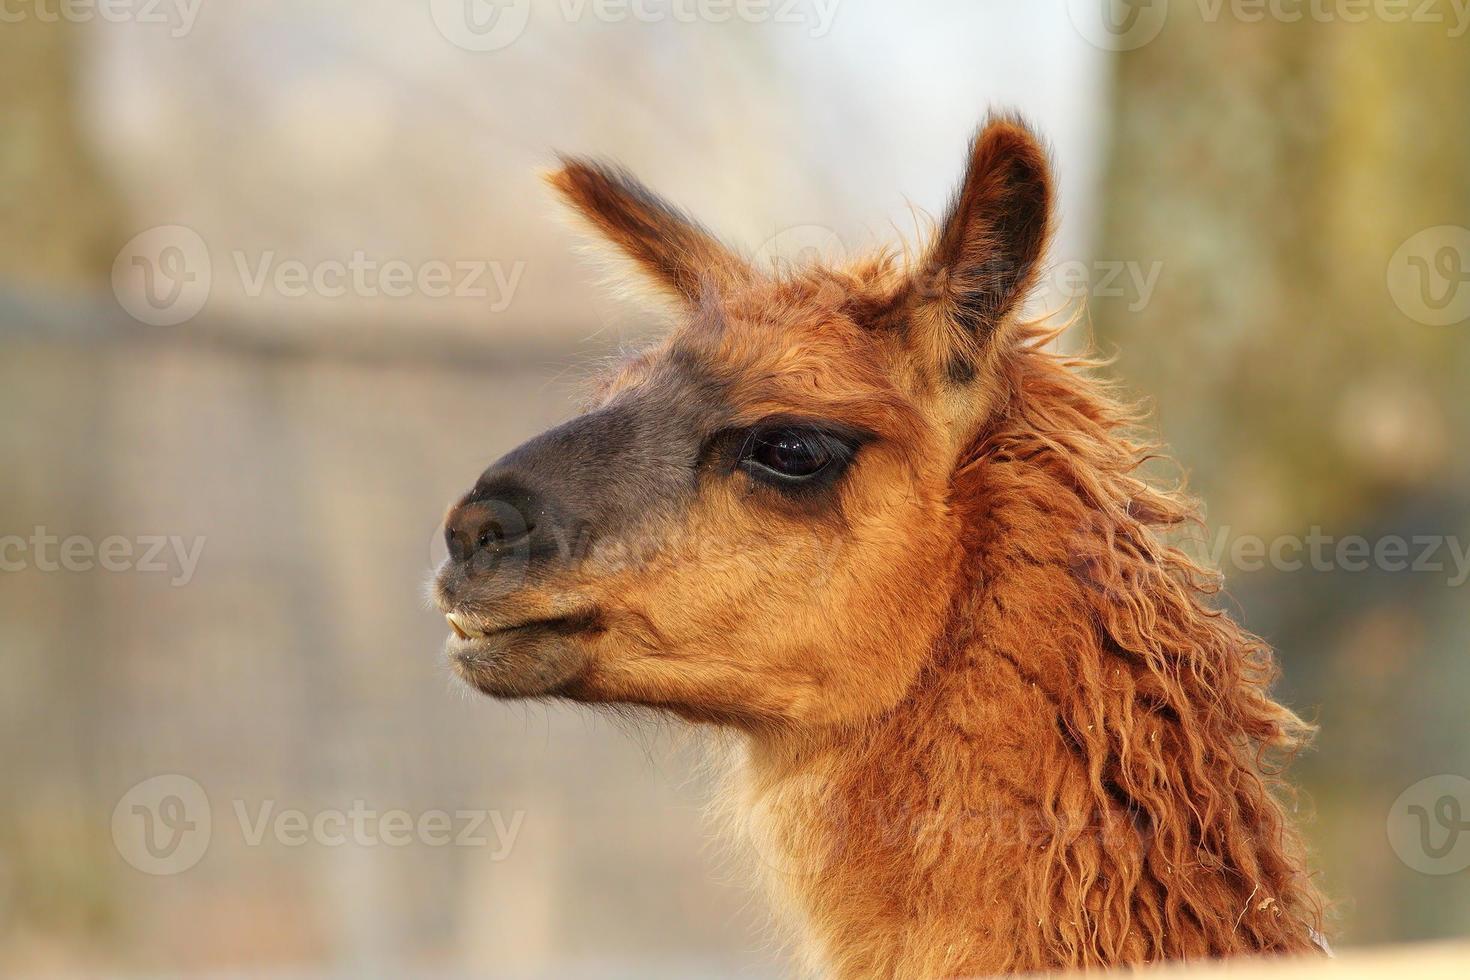 llama head close-up photo